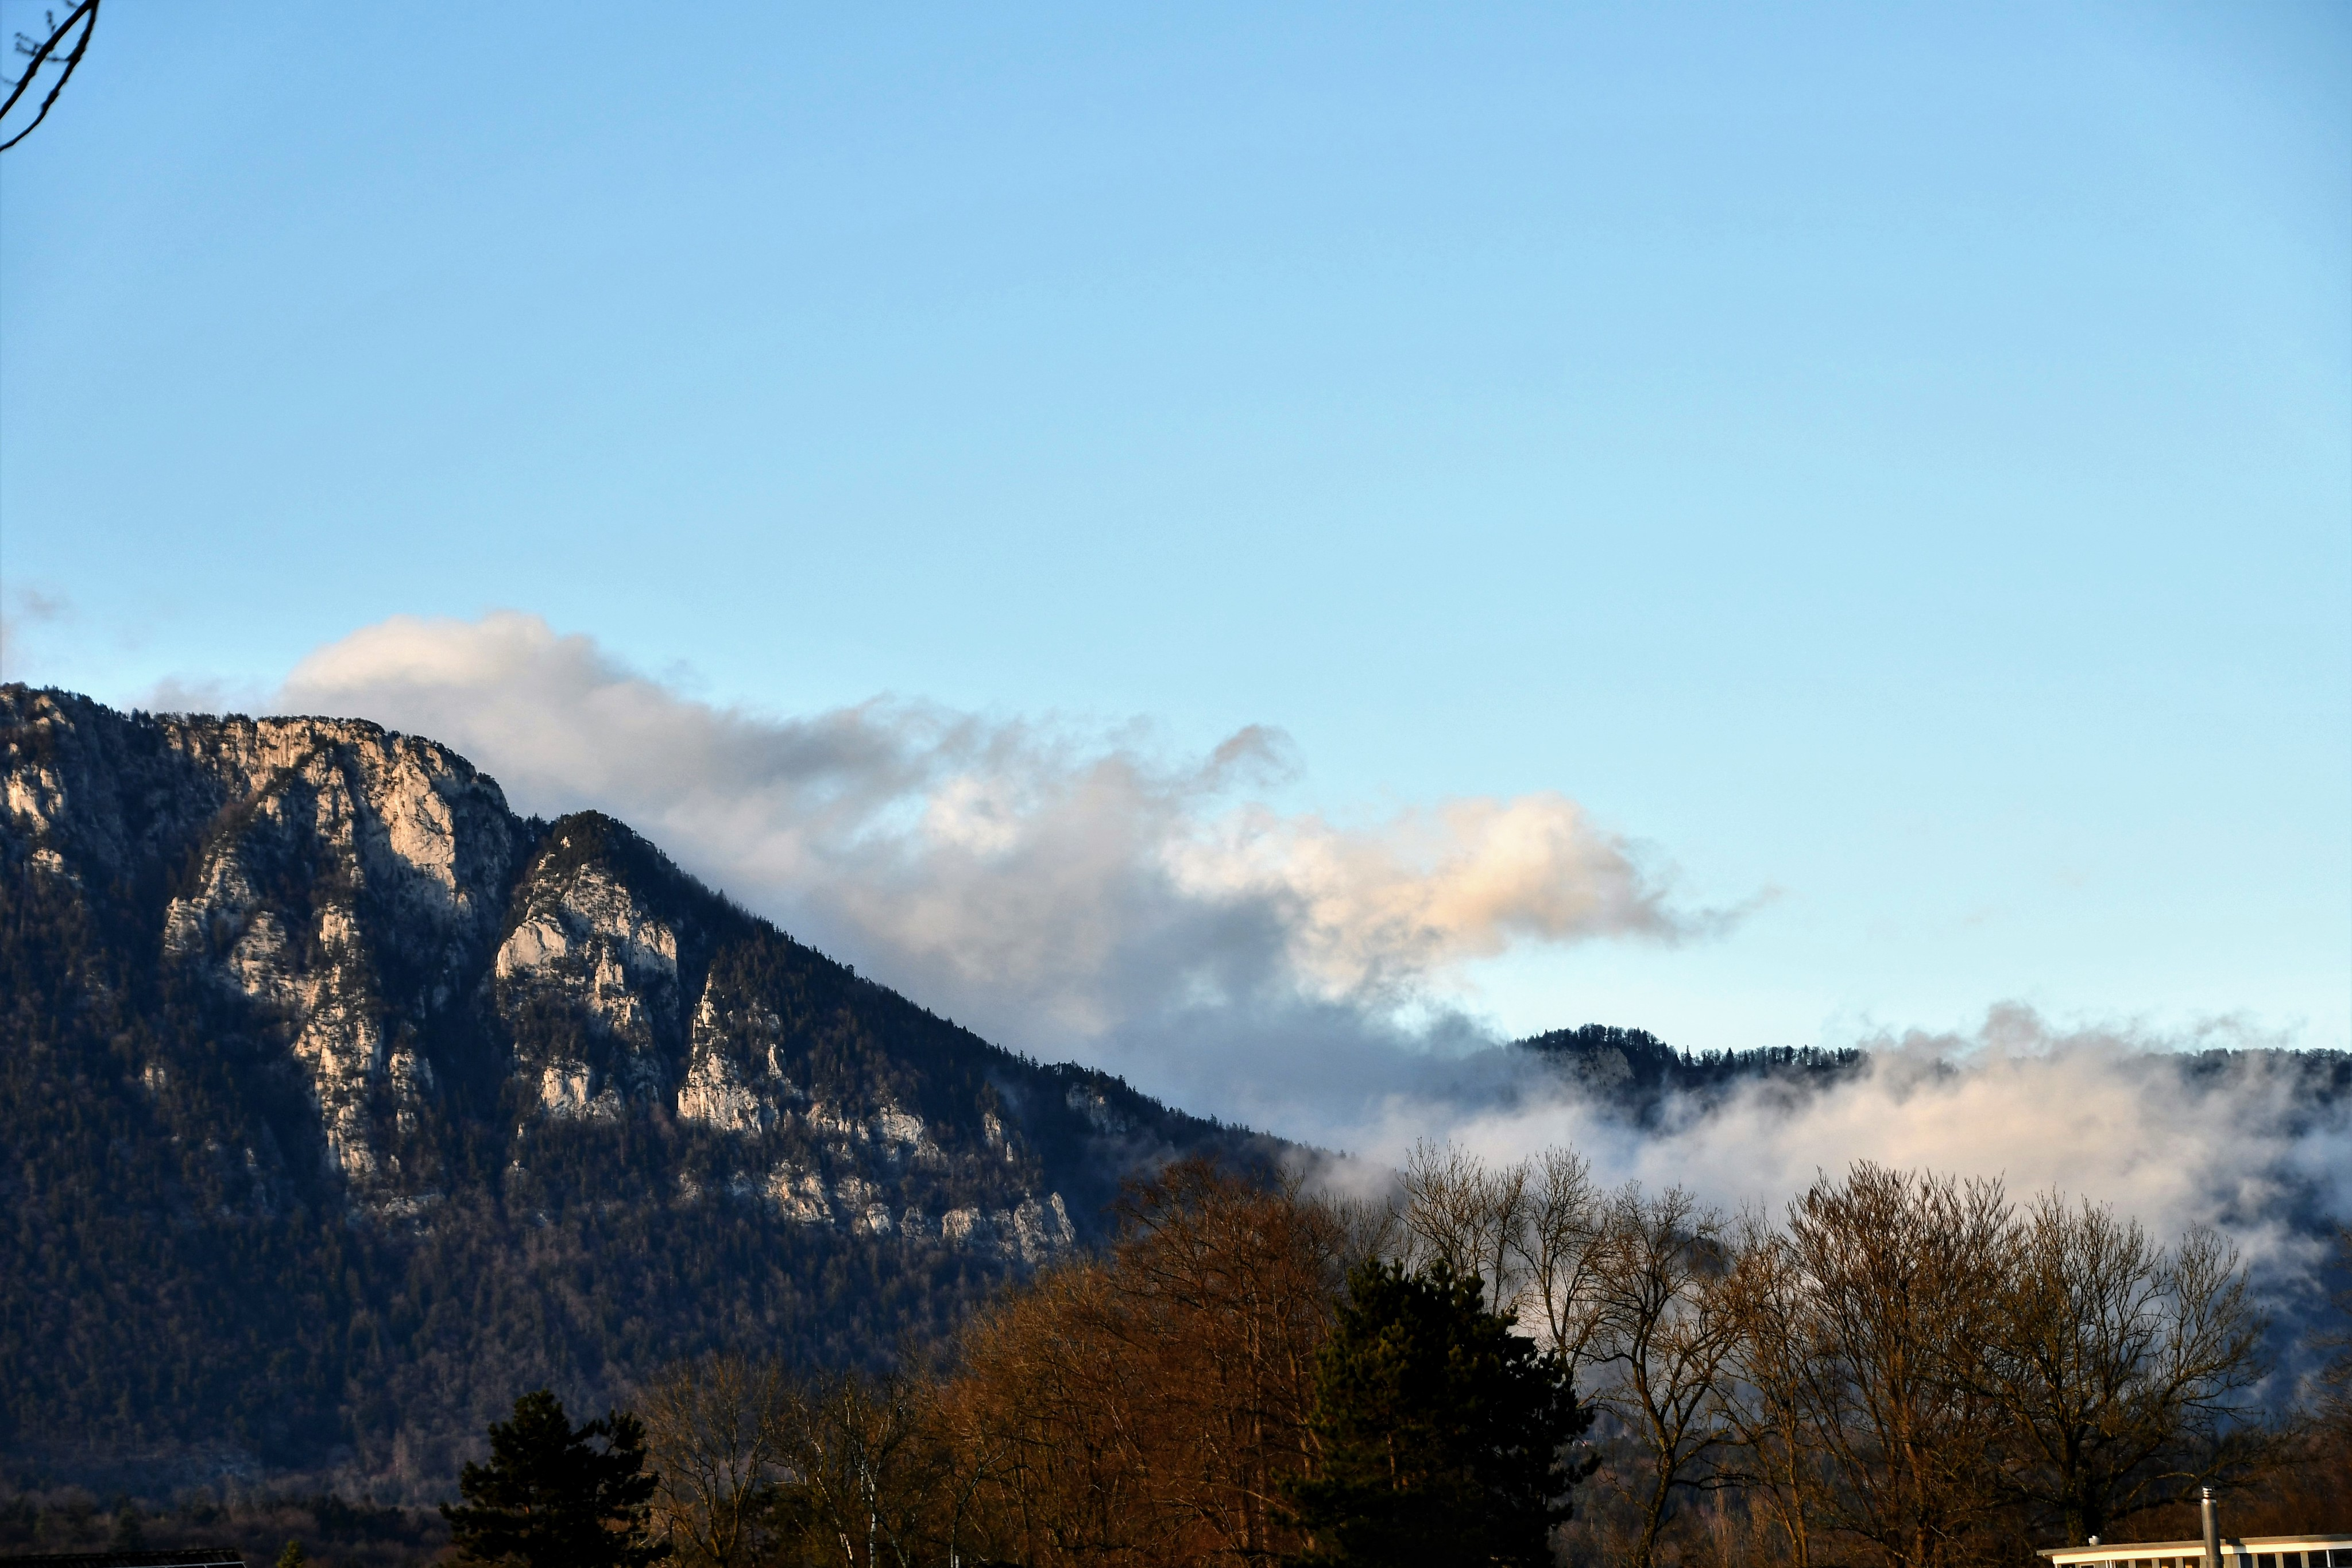 clouds-over-solothur-21.12-5